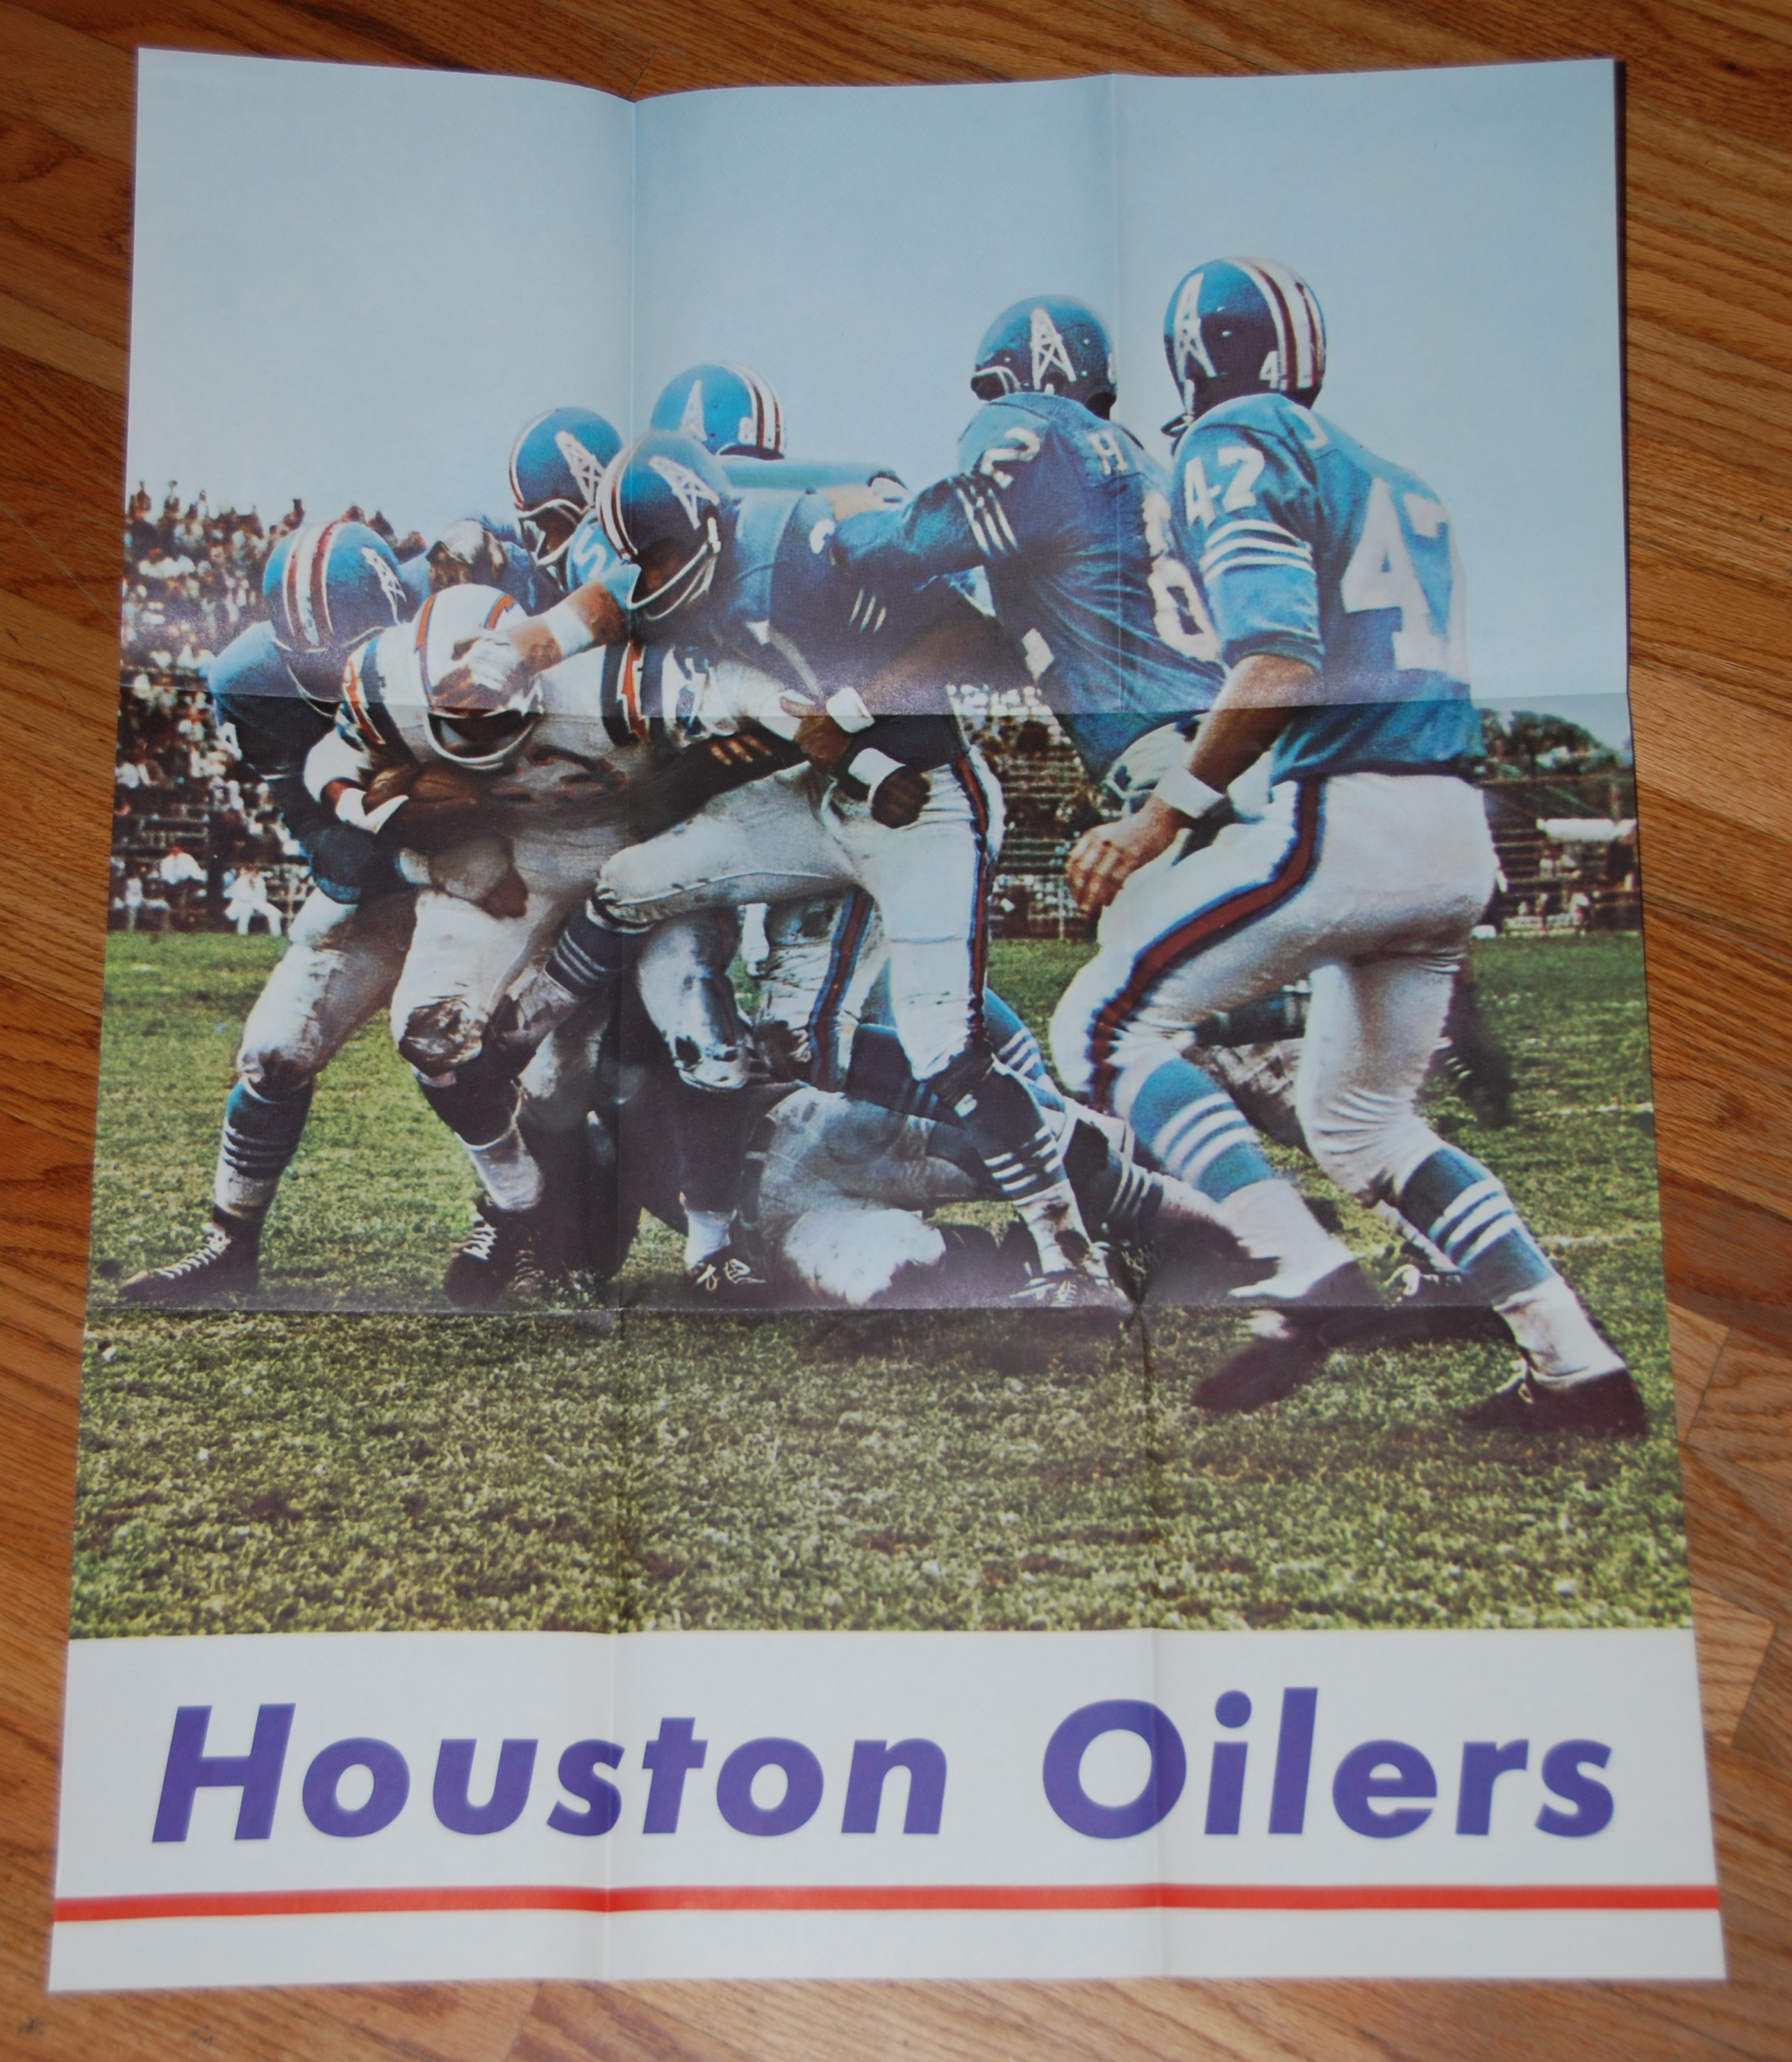 1965 Houston Oilers Yearbook   Insert Poster  c7292dab8